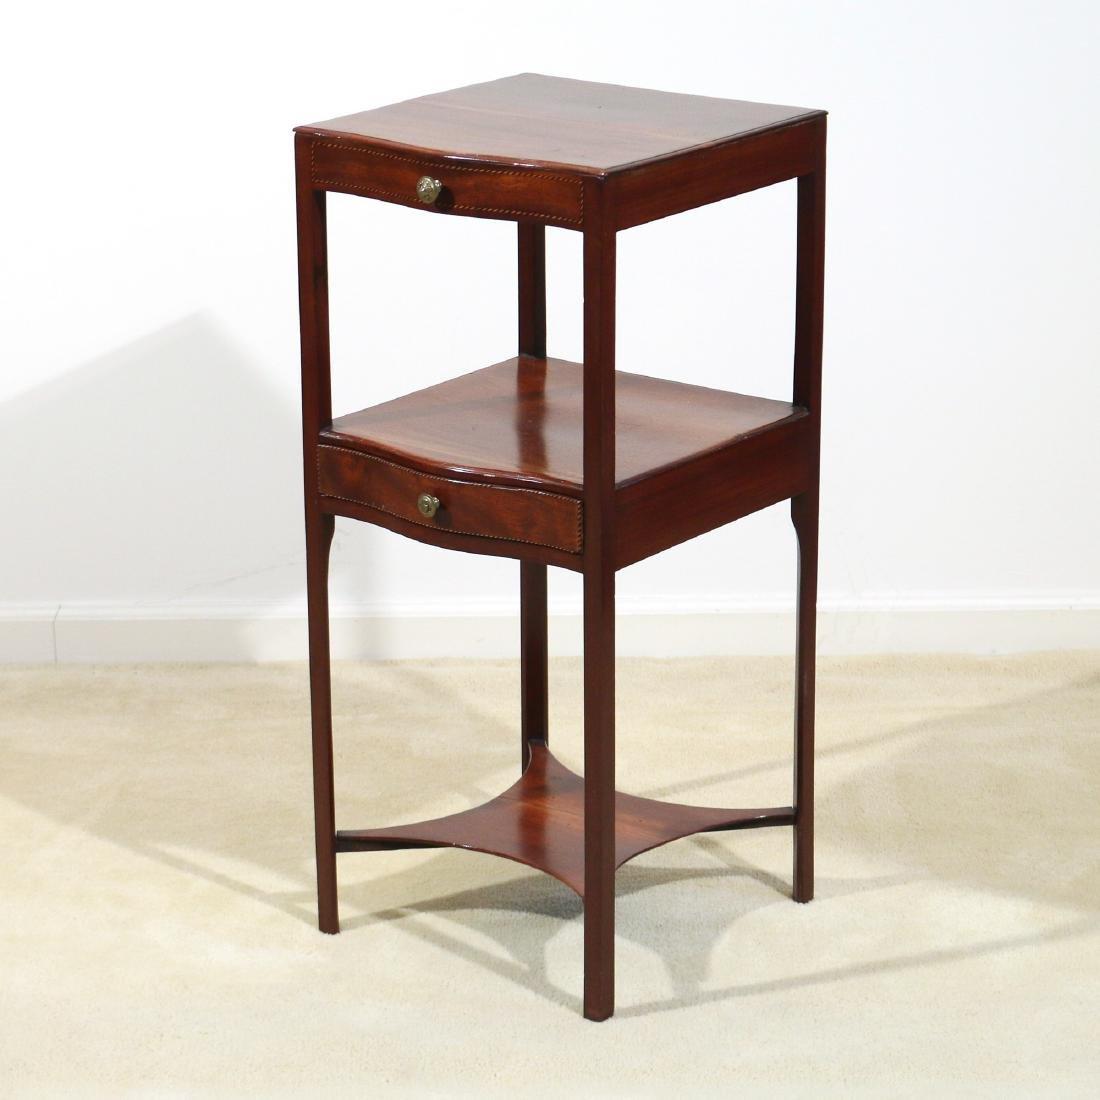 HEPPLEWHITE INLAID MAHOGANY TIERED SIDE TABLE